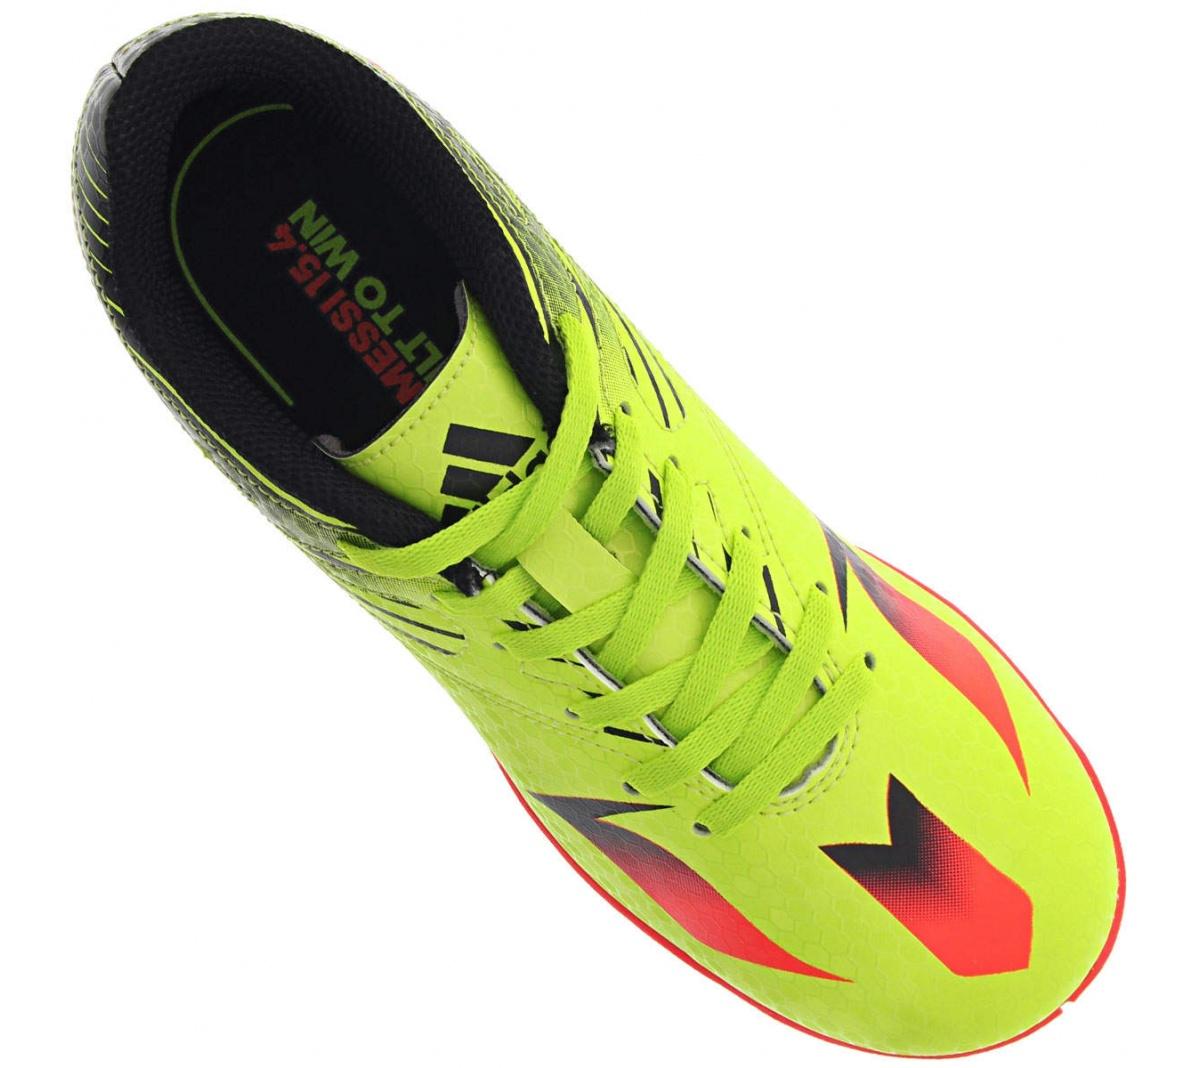 b0258f6029 Tênis Adidas Messi 15 Futsal Infantil - Mundo do Futebol